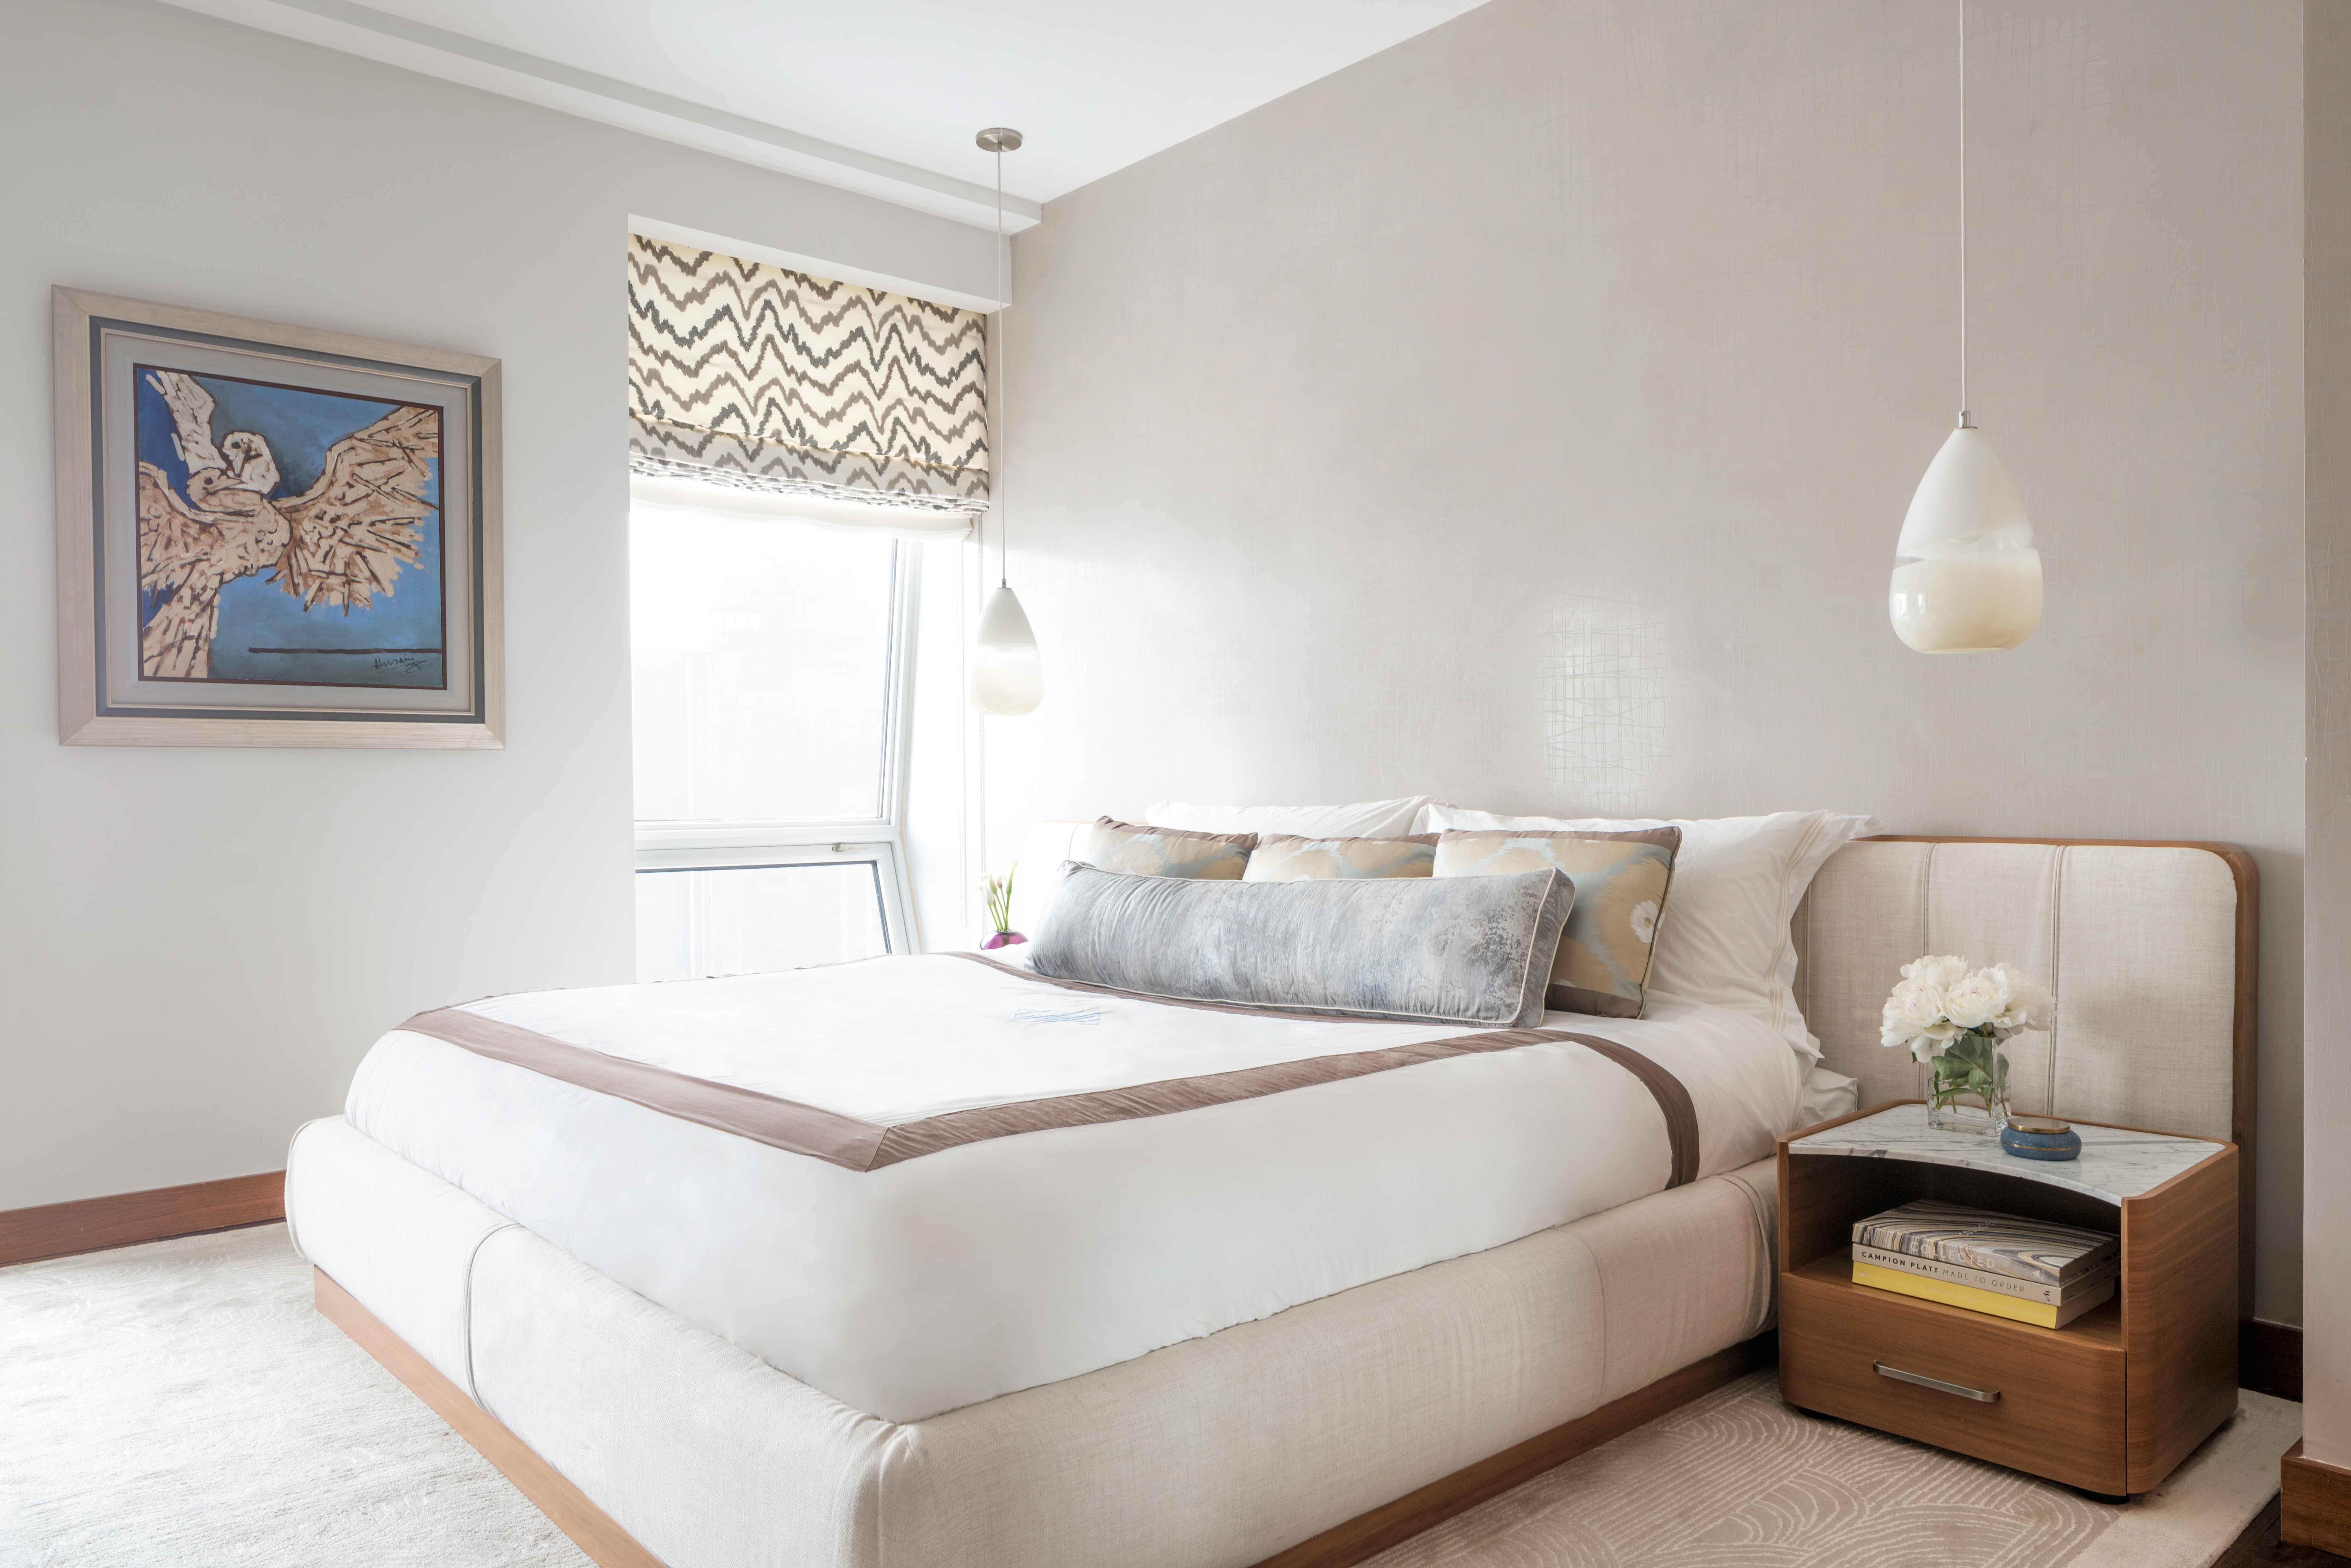 Nicole-Fuller-Interior-Designer-lower-5th-ave-pied-bedroom-13